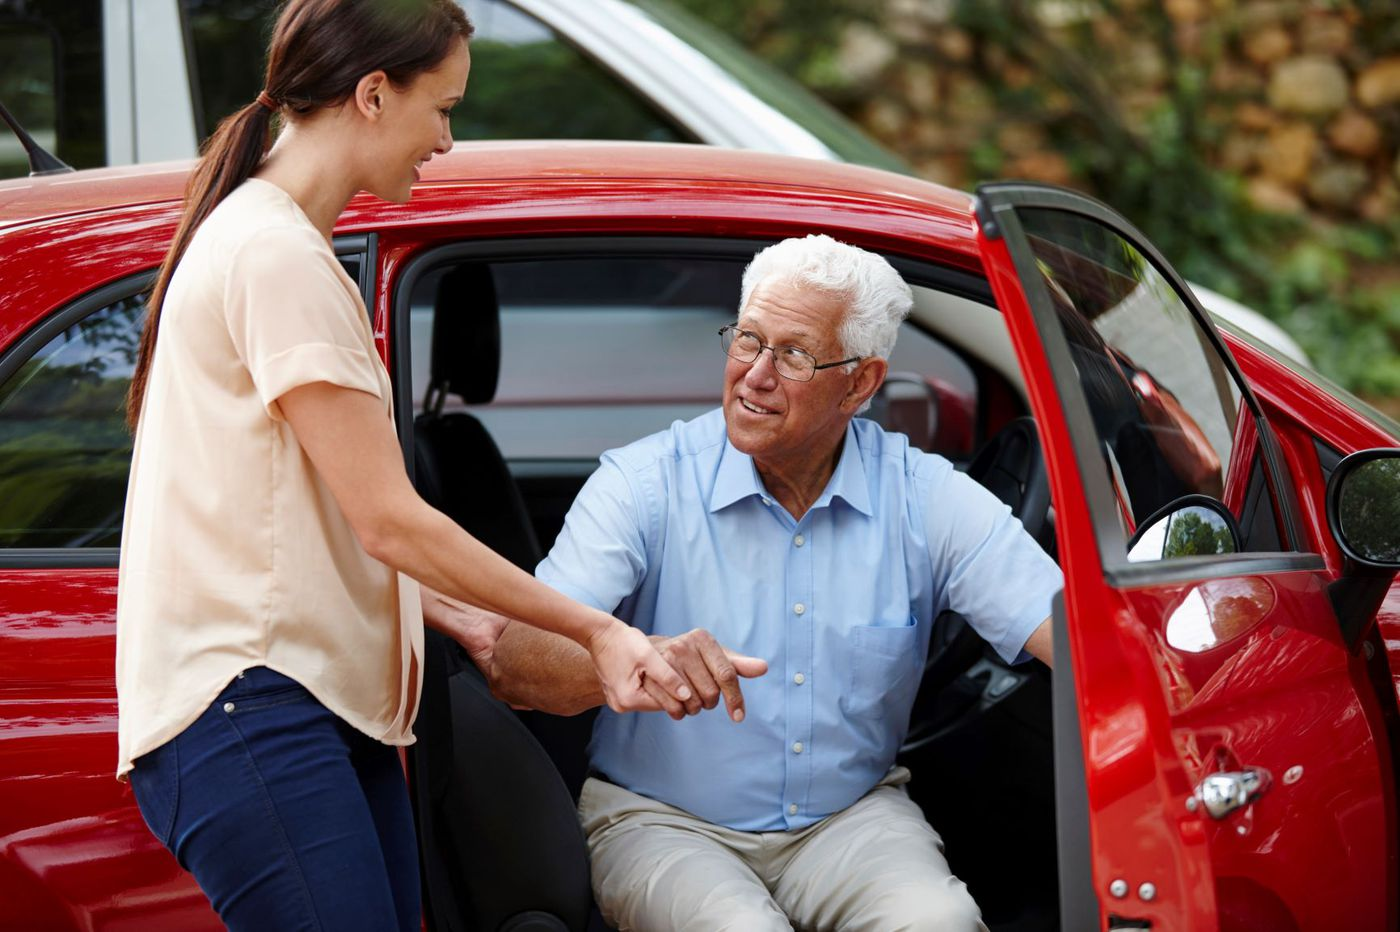 Senior care requires comprehensive transportation access   Opinion